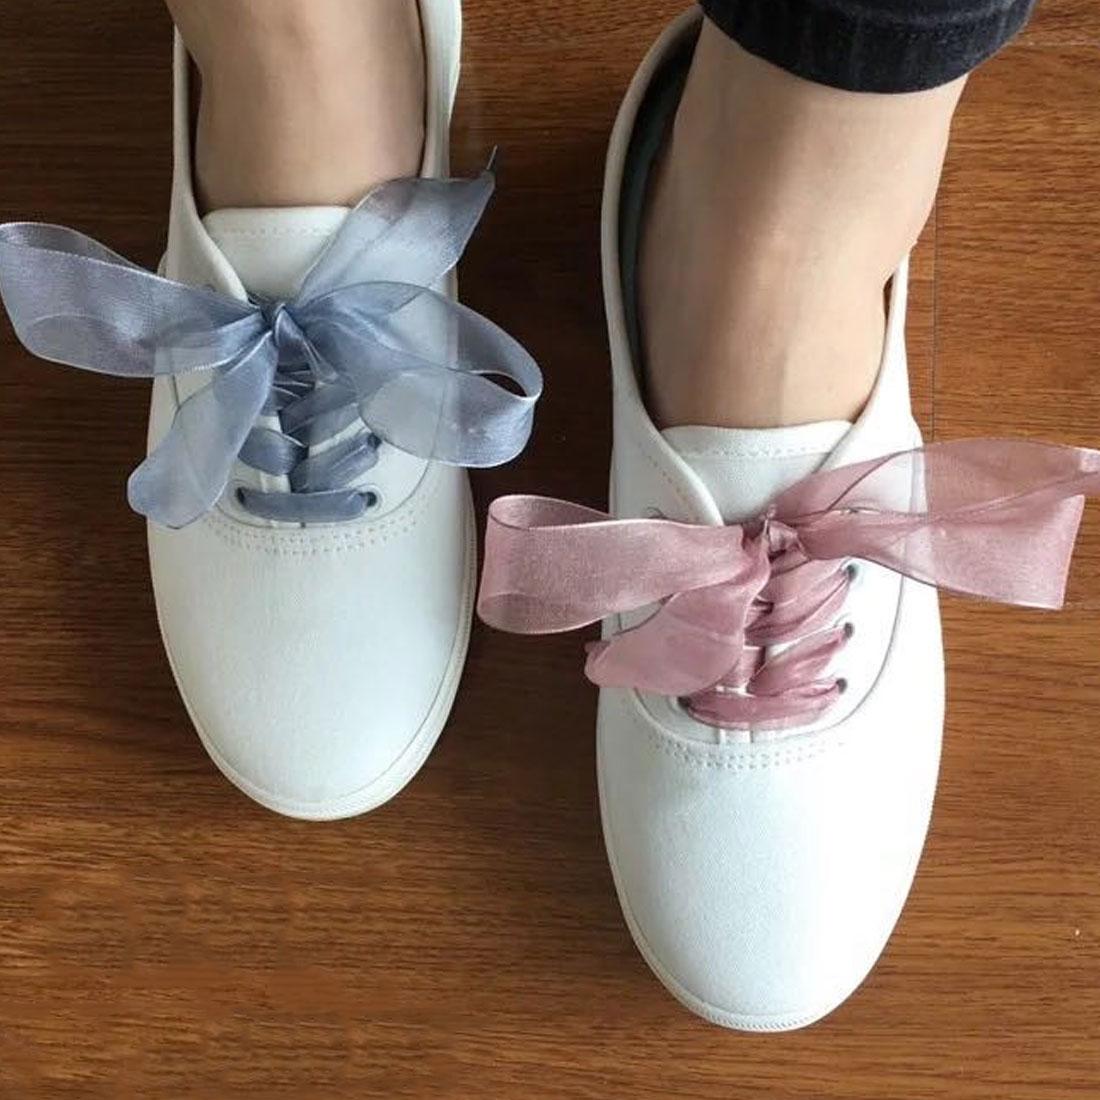 1Pair 100CM Candy Color Lace Belt Yarn Shoelaces For Women Durable Wide Shoestring Casual Style Decrations Canvas Shoes Shoelace